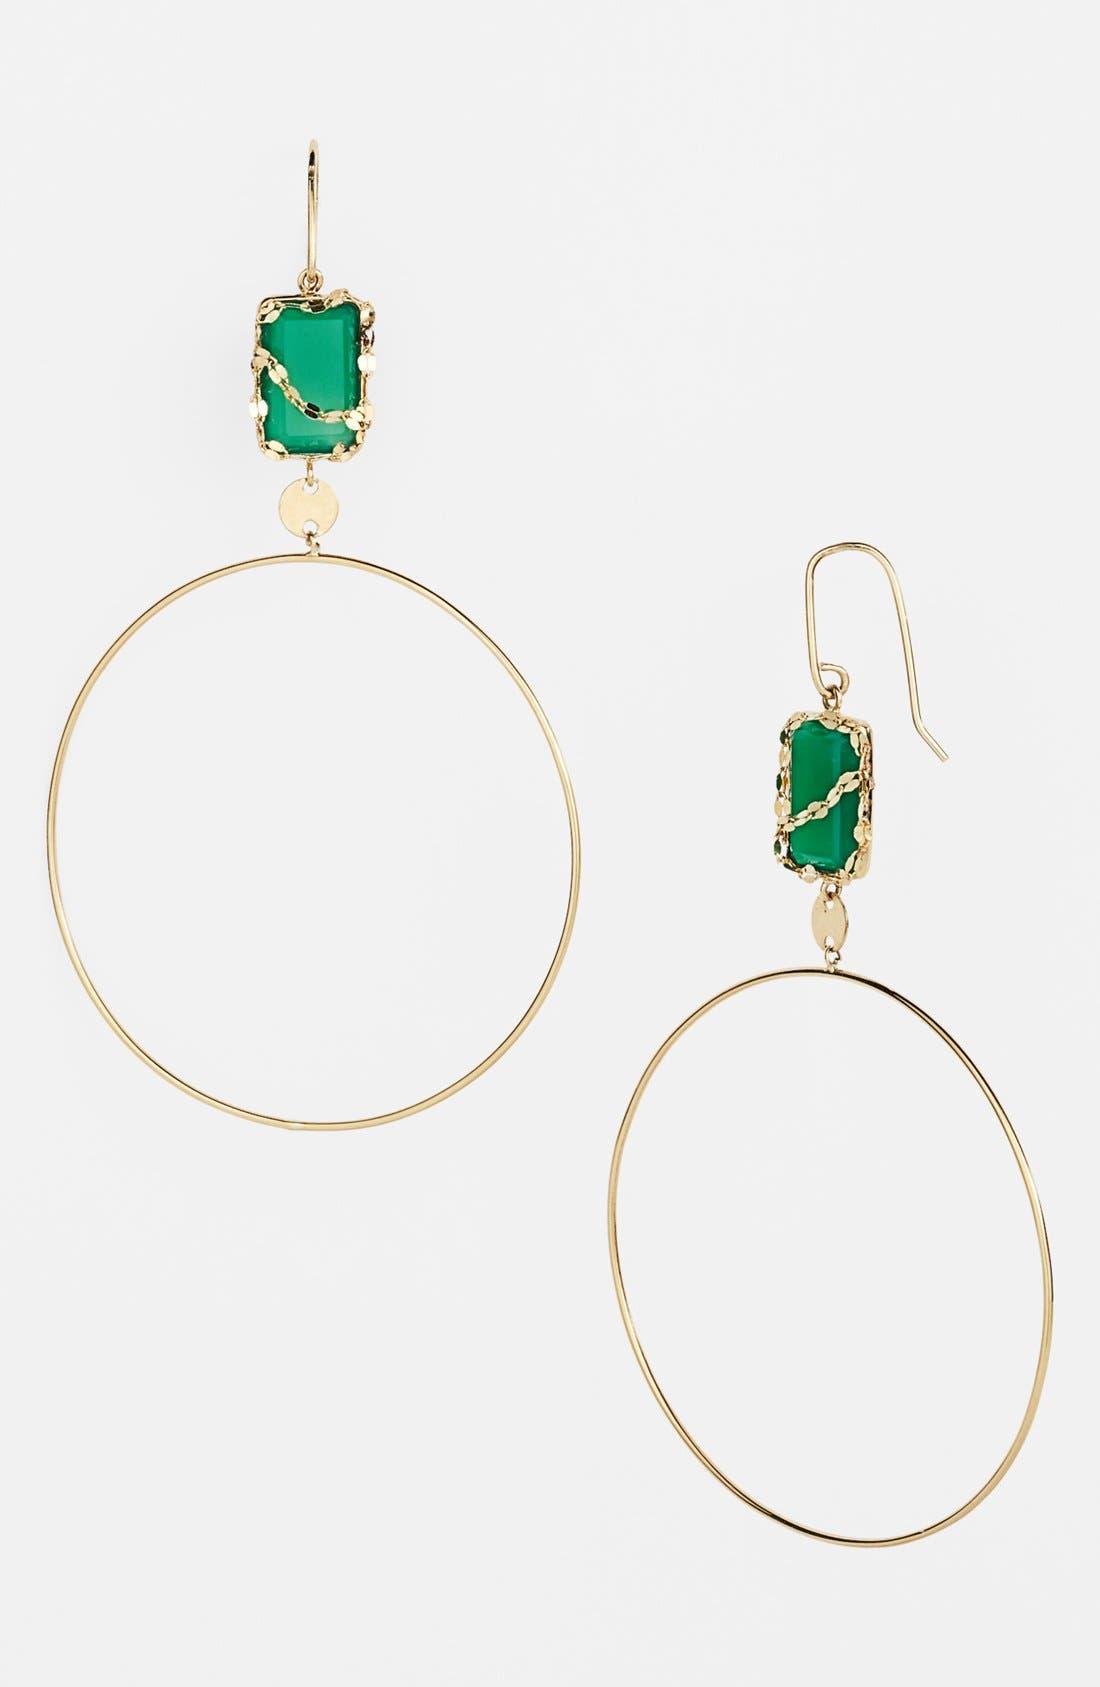 Main Image - Lana Jewelry 'Spellbound - Small Glow' Dangle Hoop Earrings (Nordstrom Exclusive)